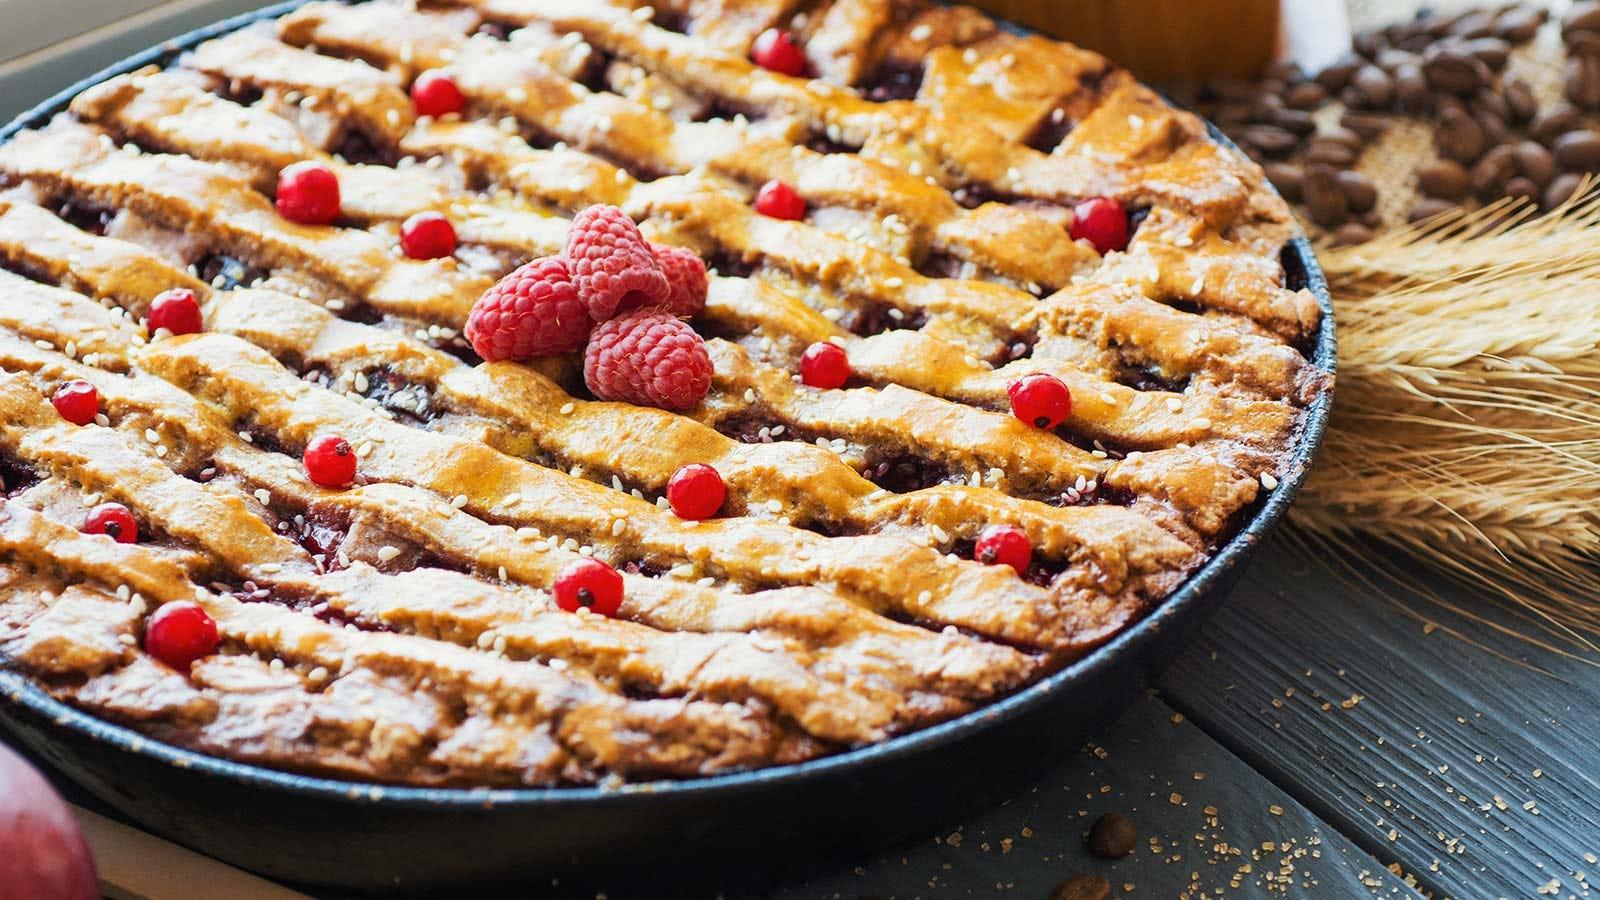 A berry pie with a golden lattice crust.